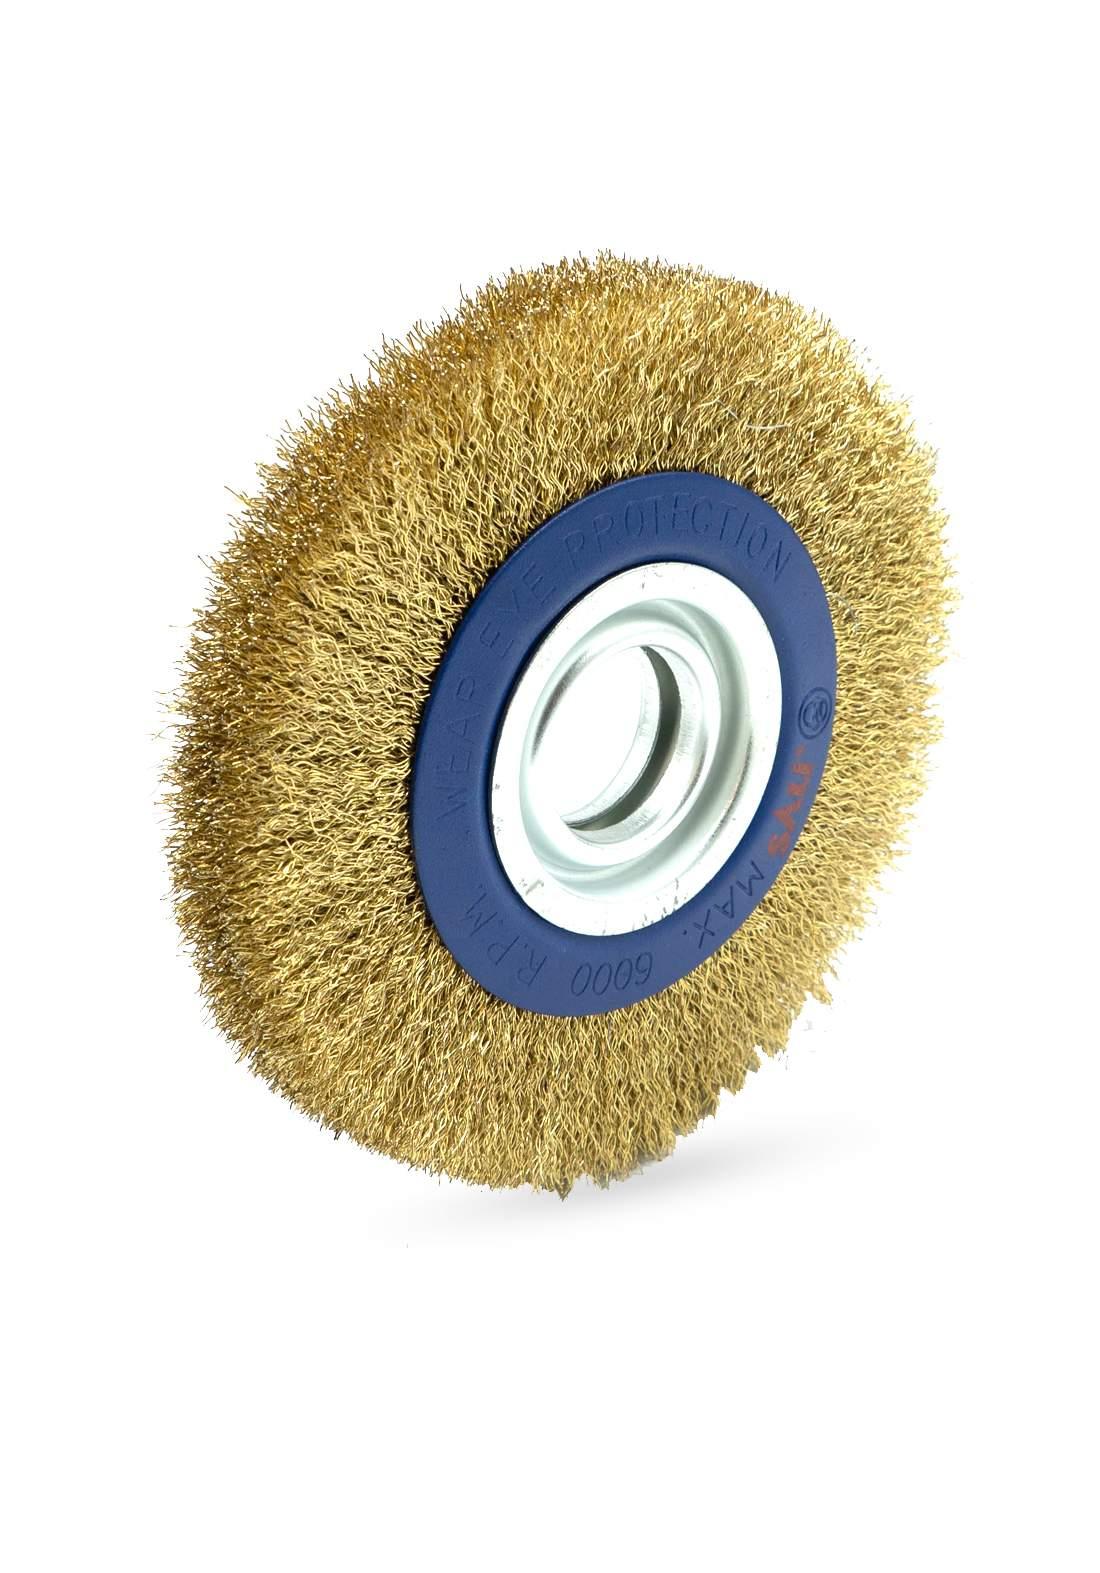 Sali 7233 Tools Wire Brush 200 mm فرشاة تنظيف الاسطح المعدنية